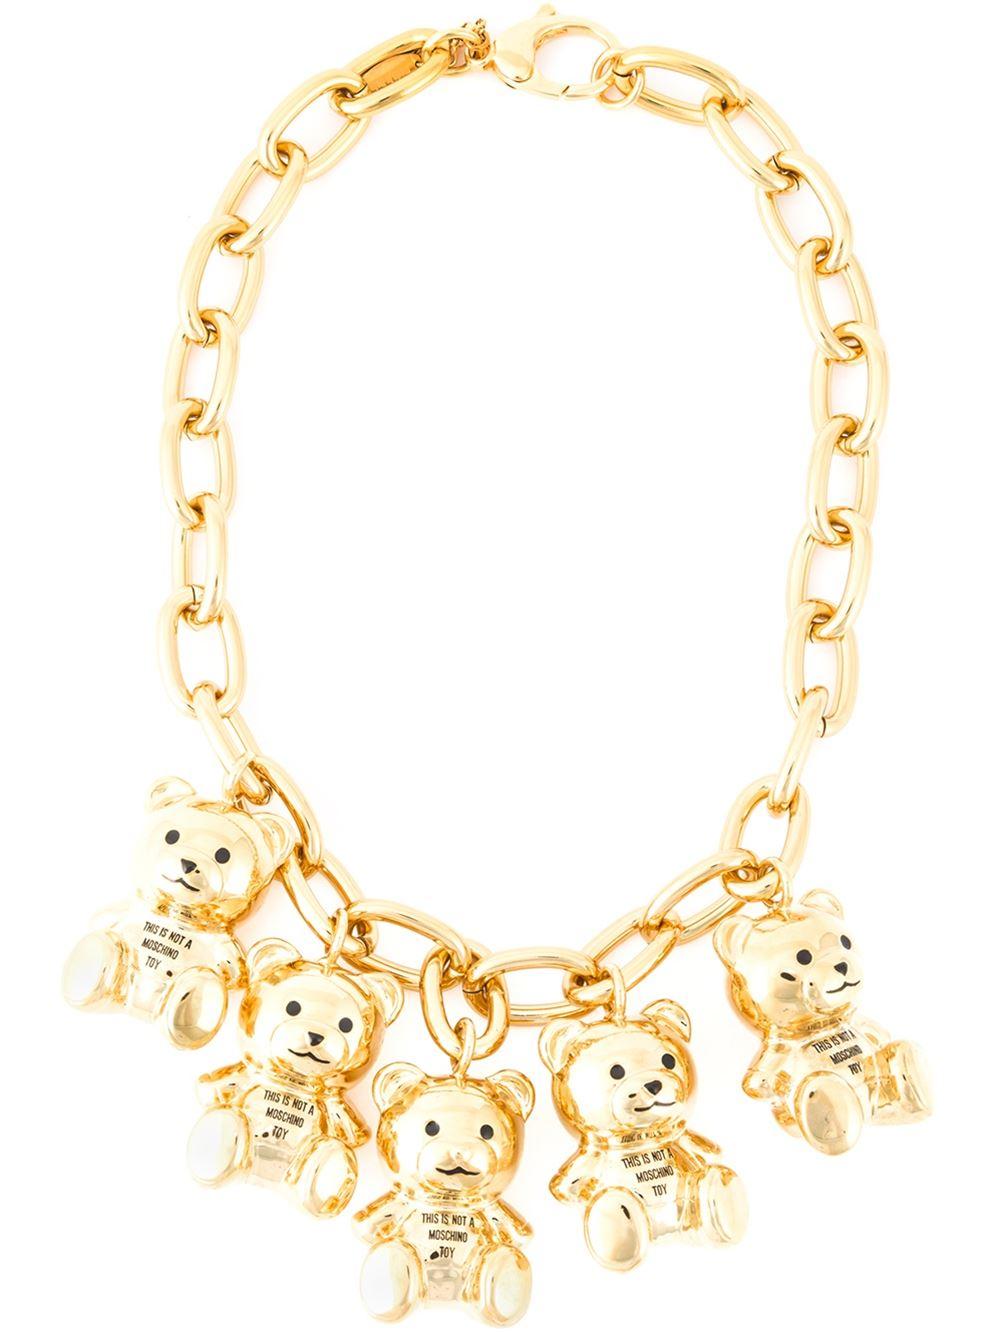 moschino_necklace.jpg